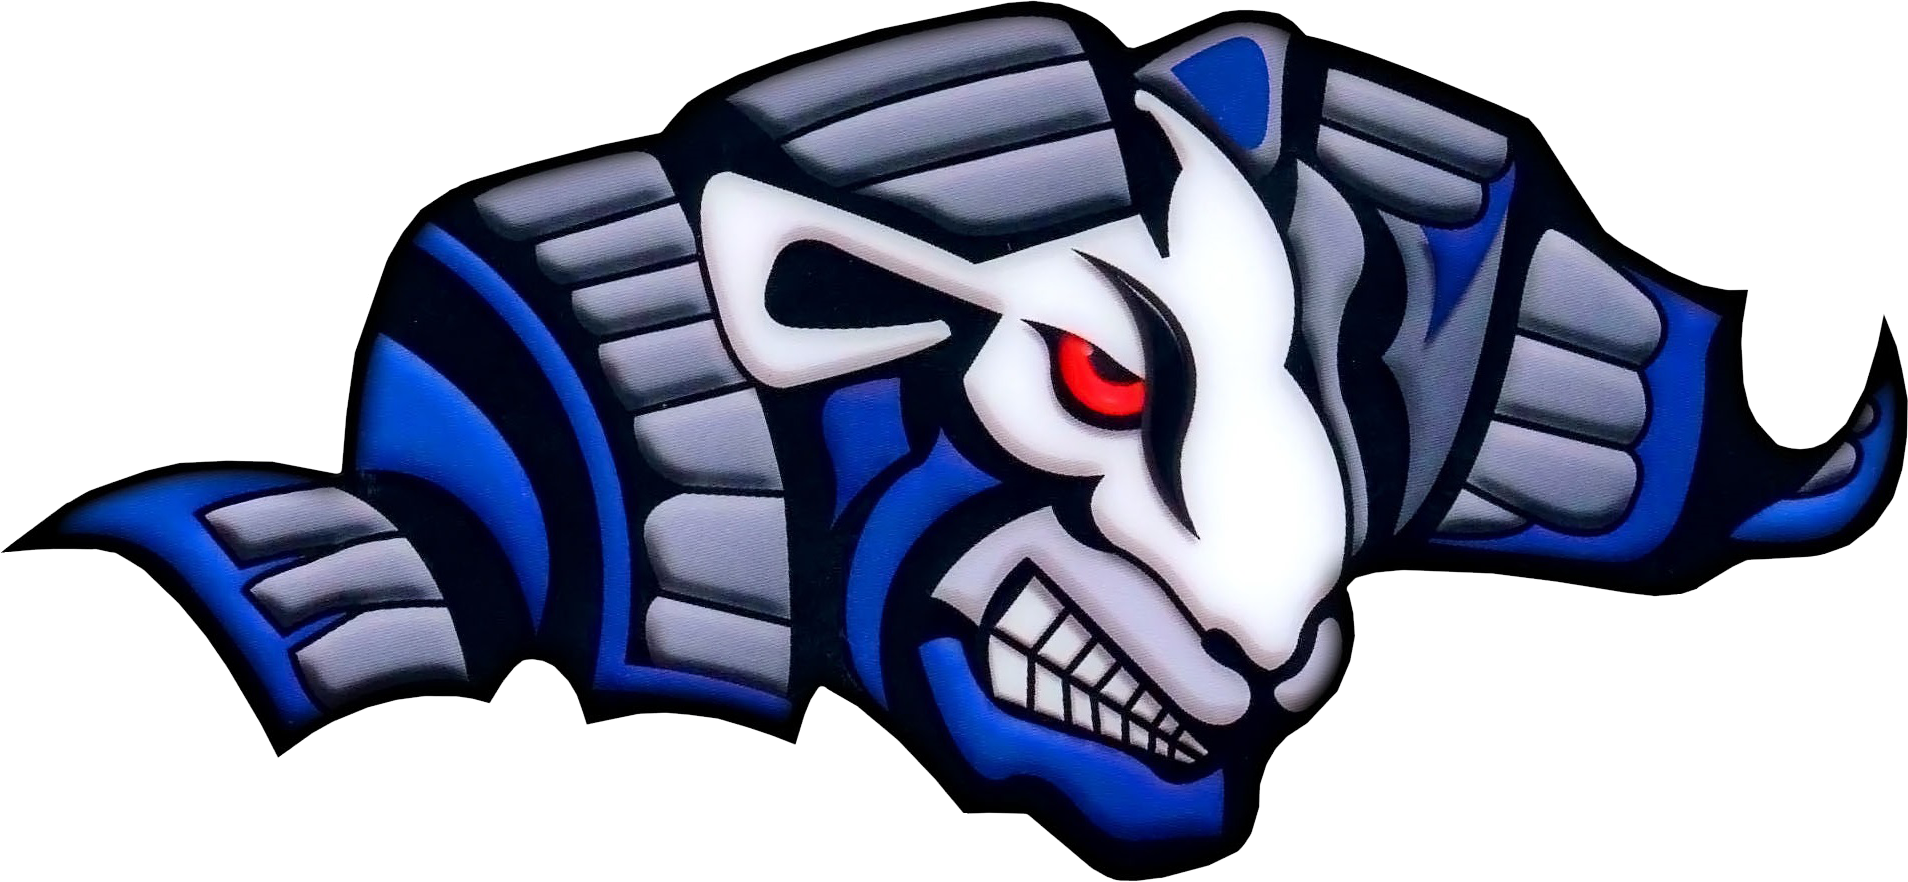 Akron ram logo 1 social media